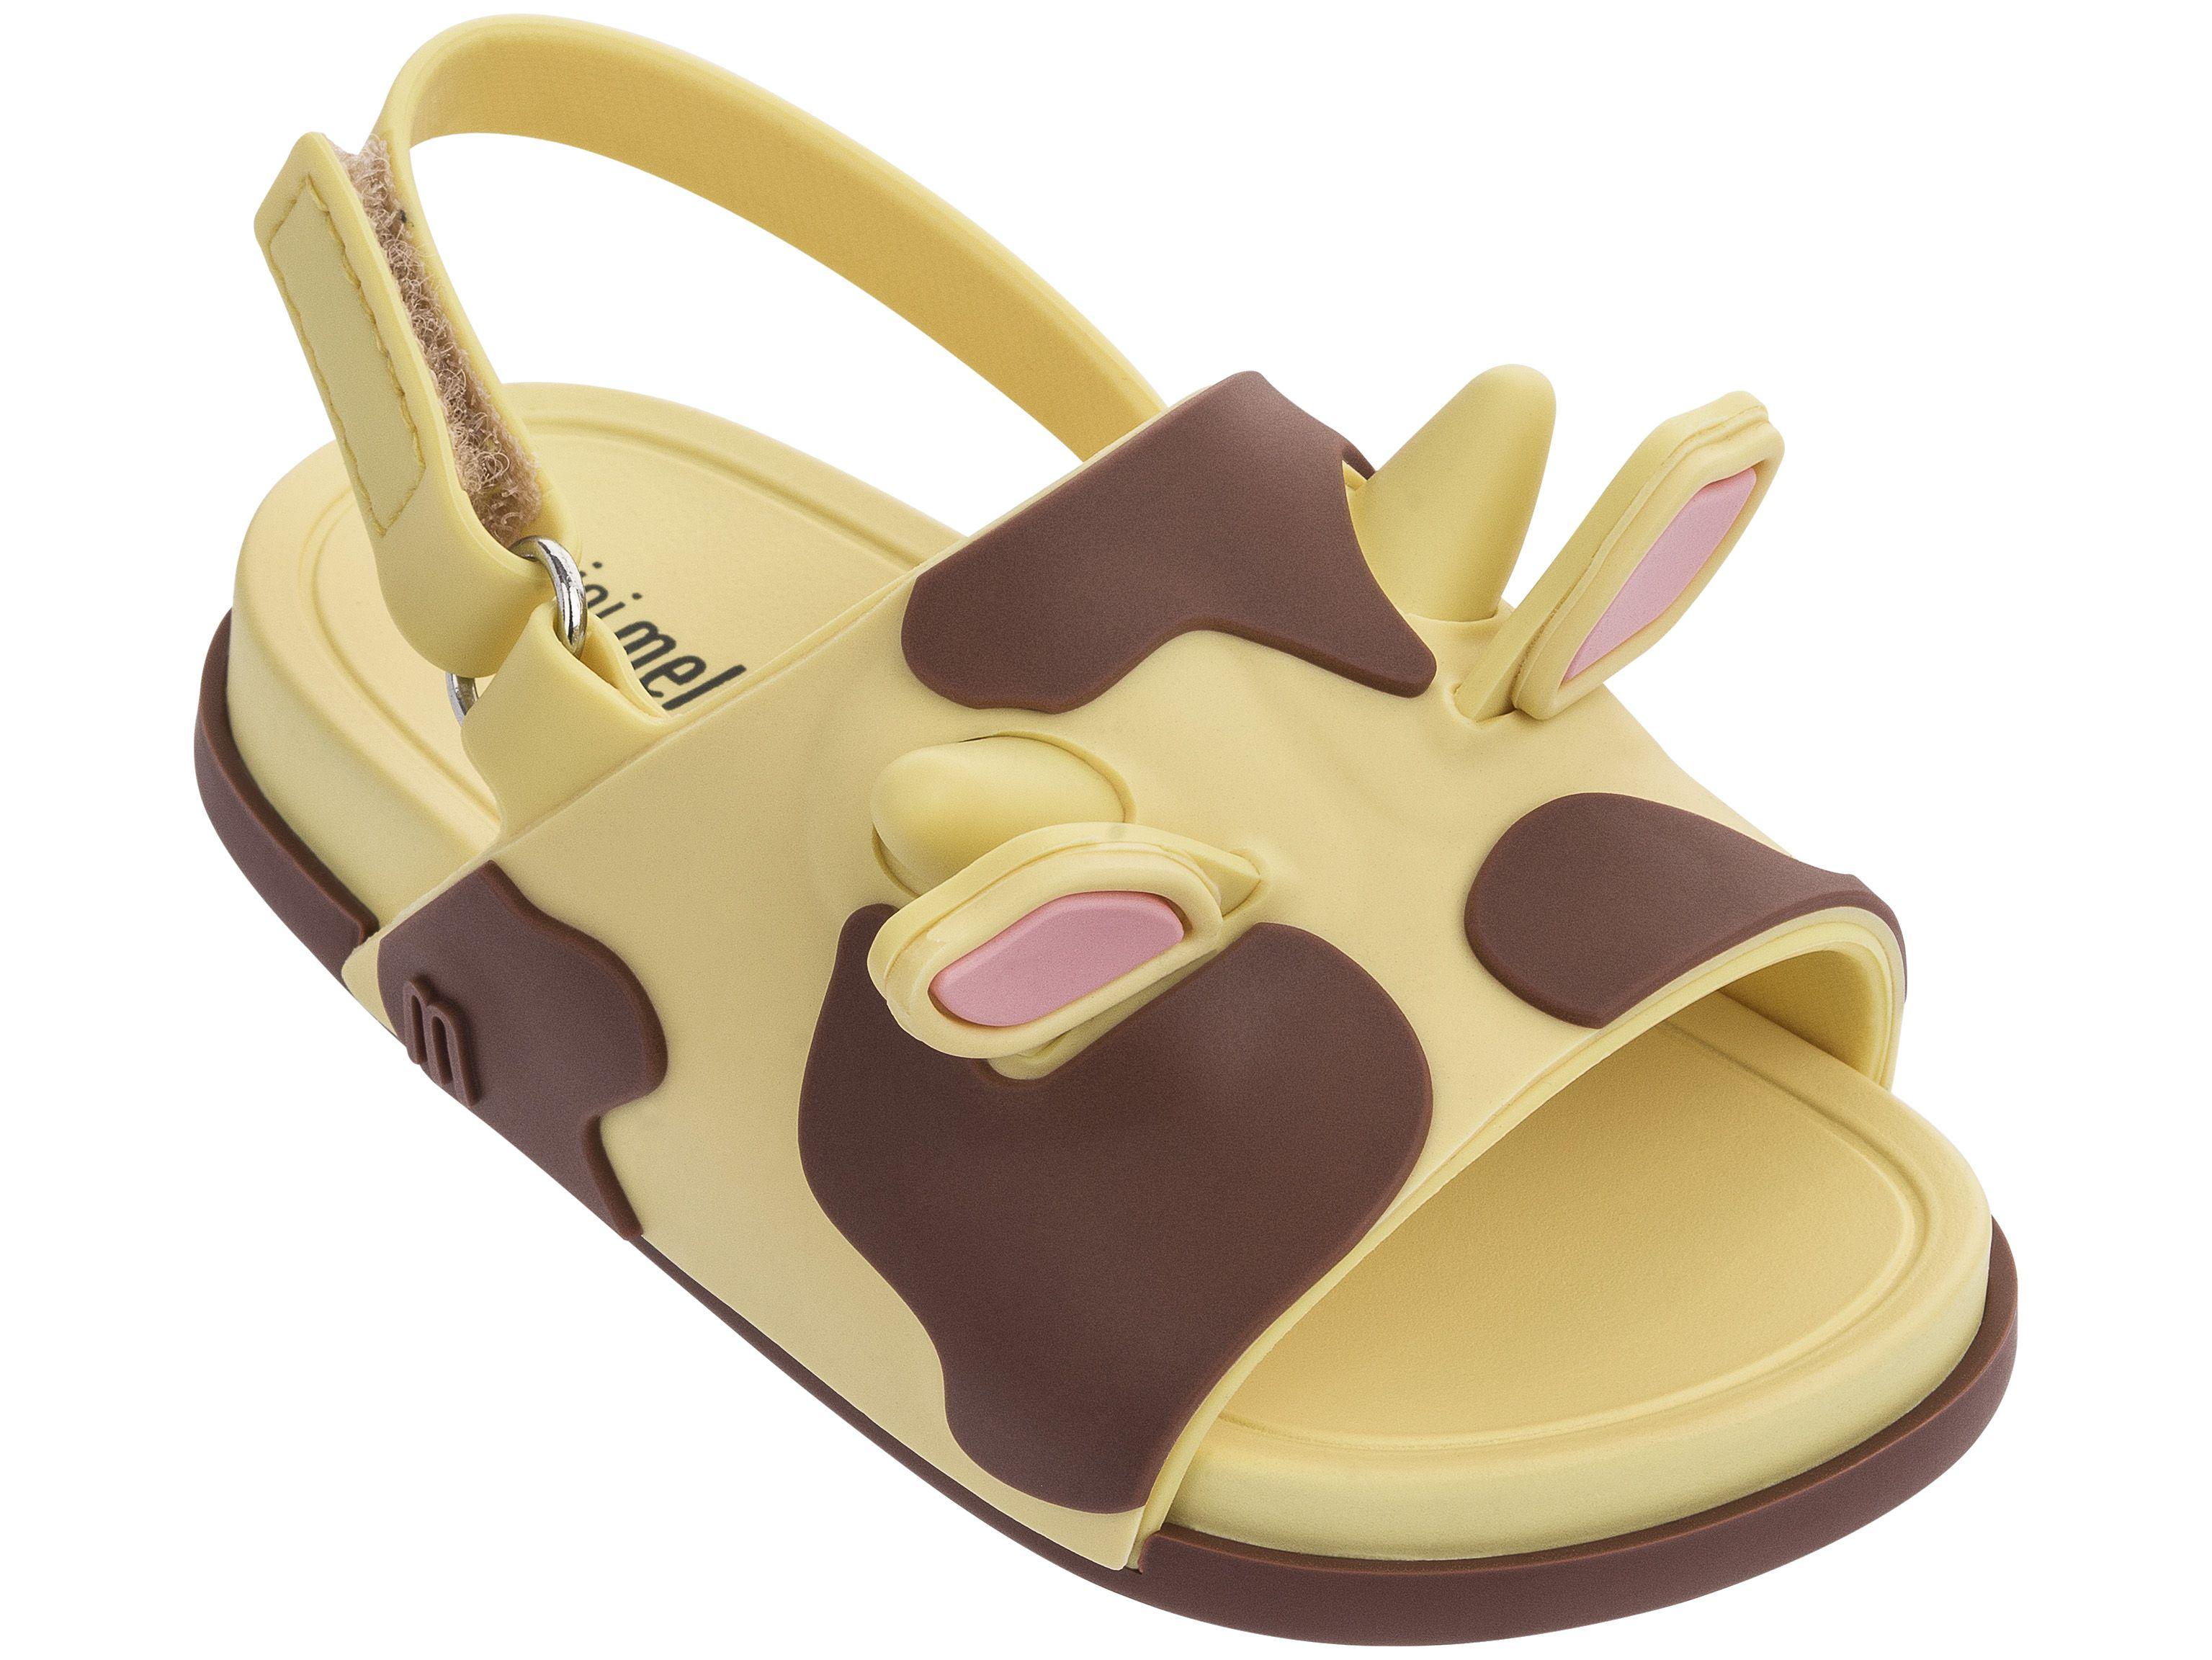 Mini Melissa Beach Slide Sandal Ii Of In Melissa South Africa